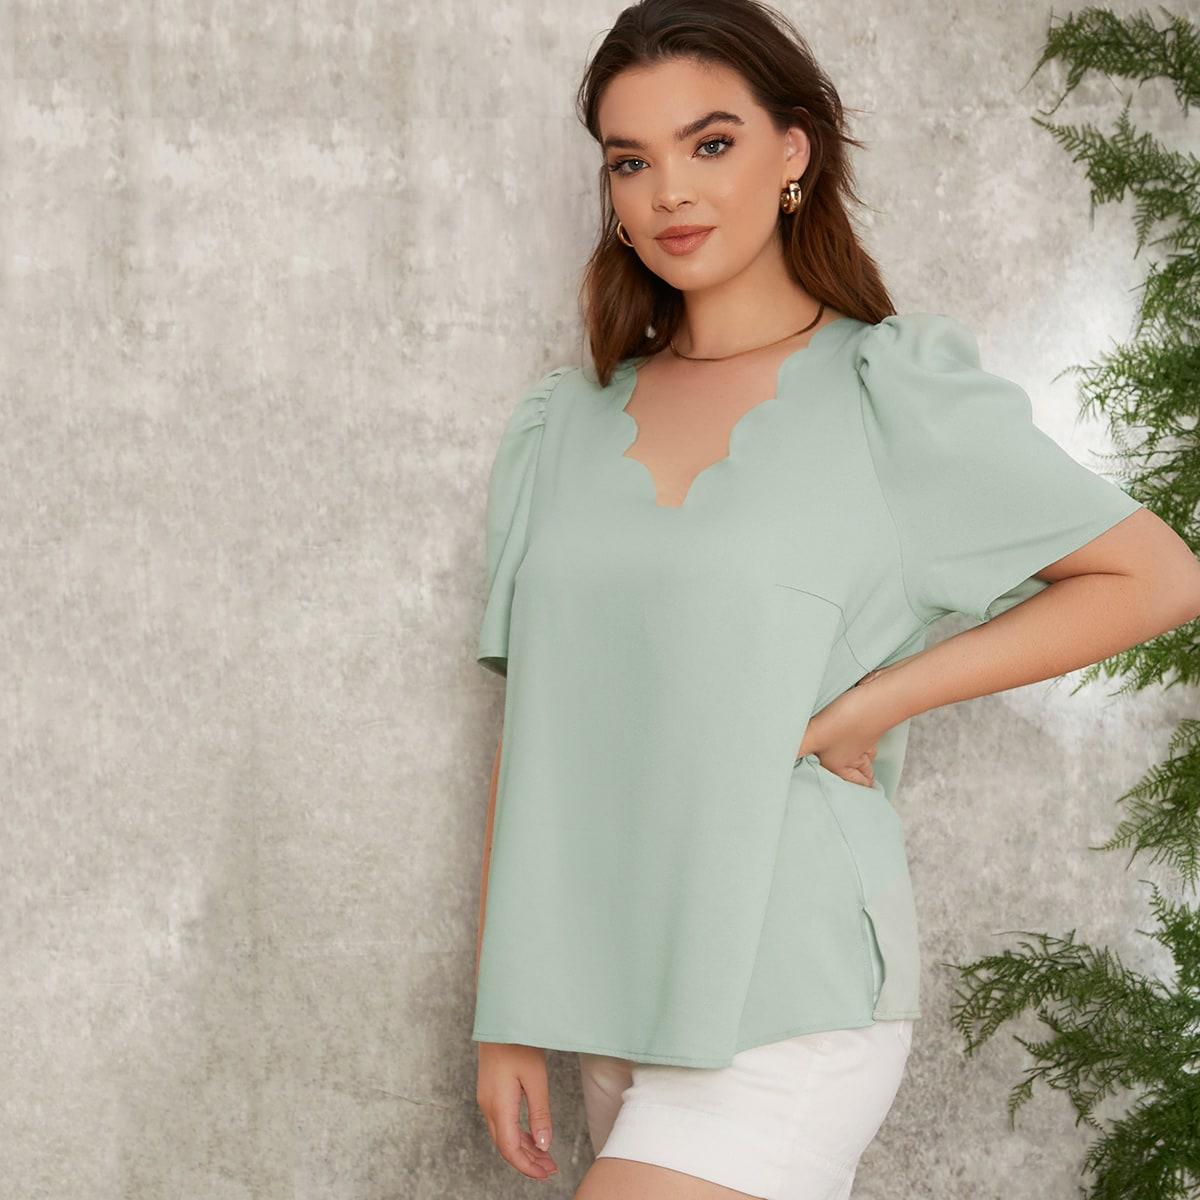 SHEIN Casual Vlak Grote maat blouse Schulp